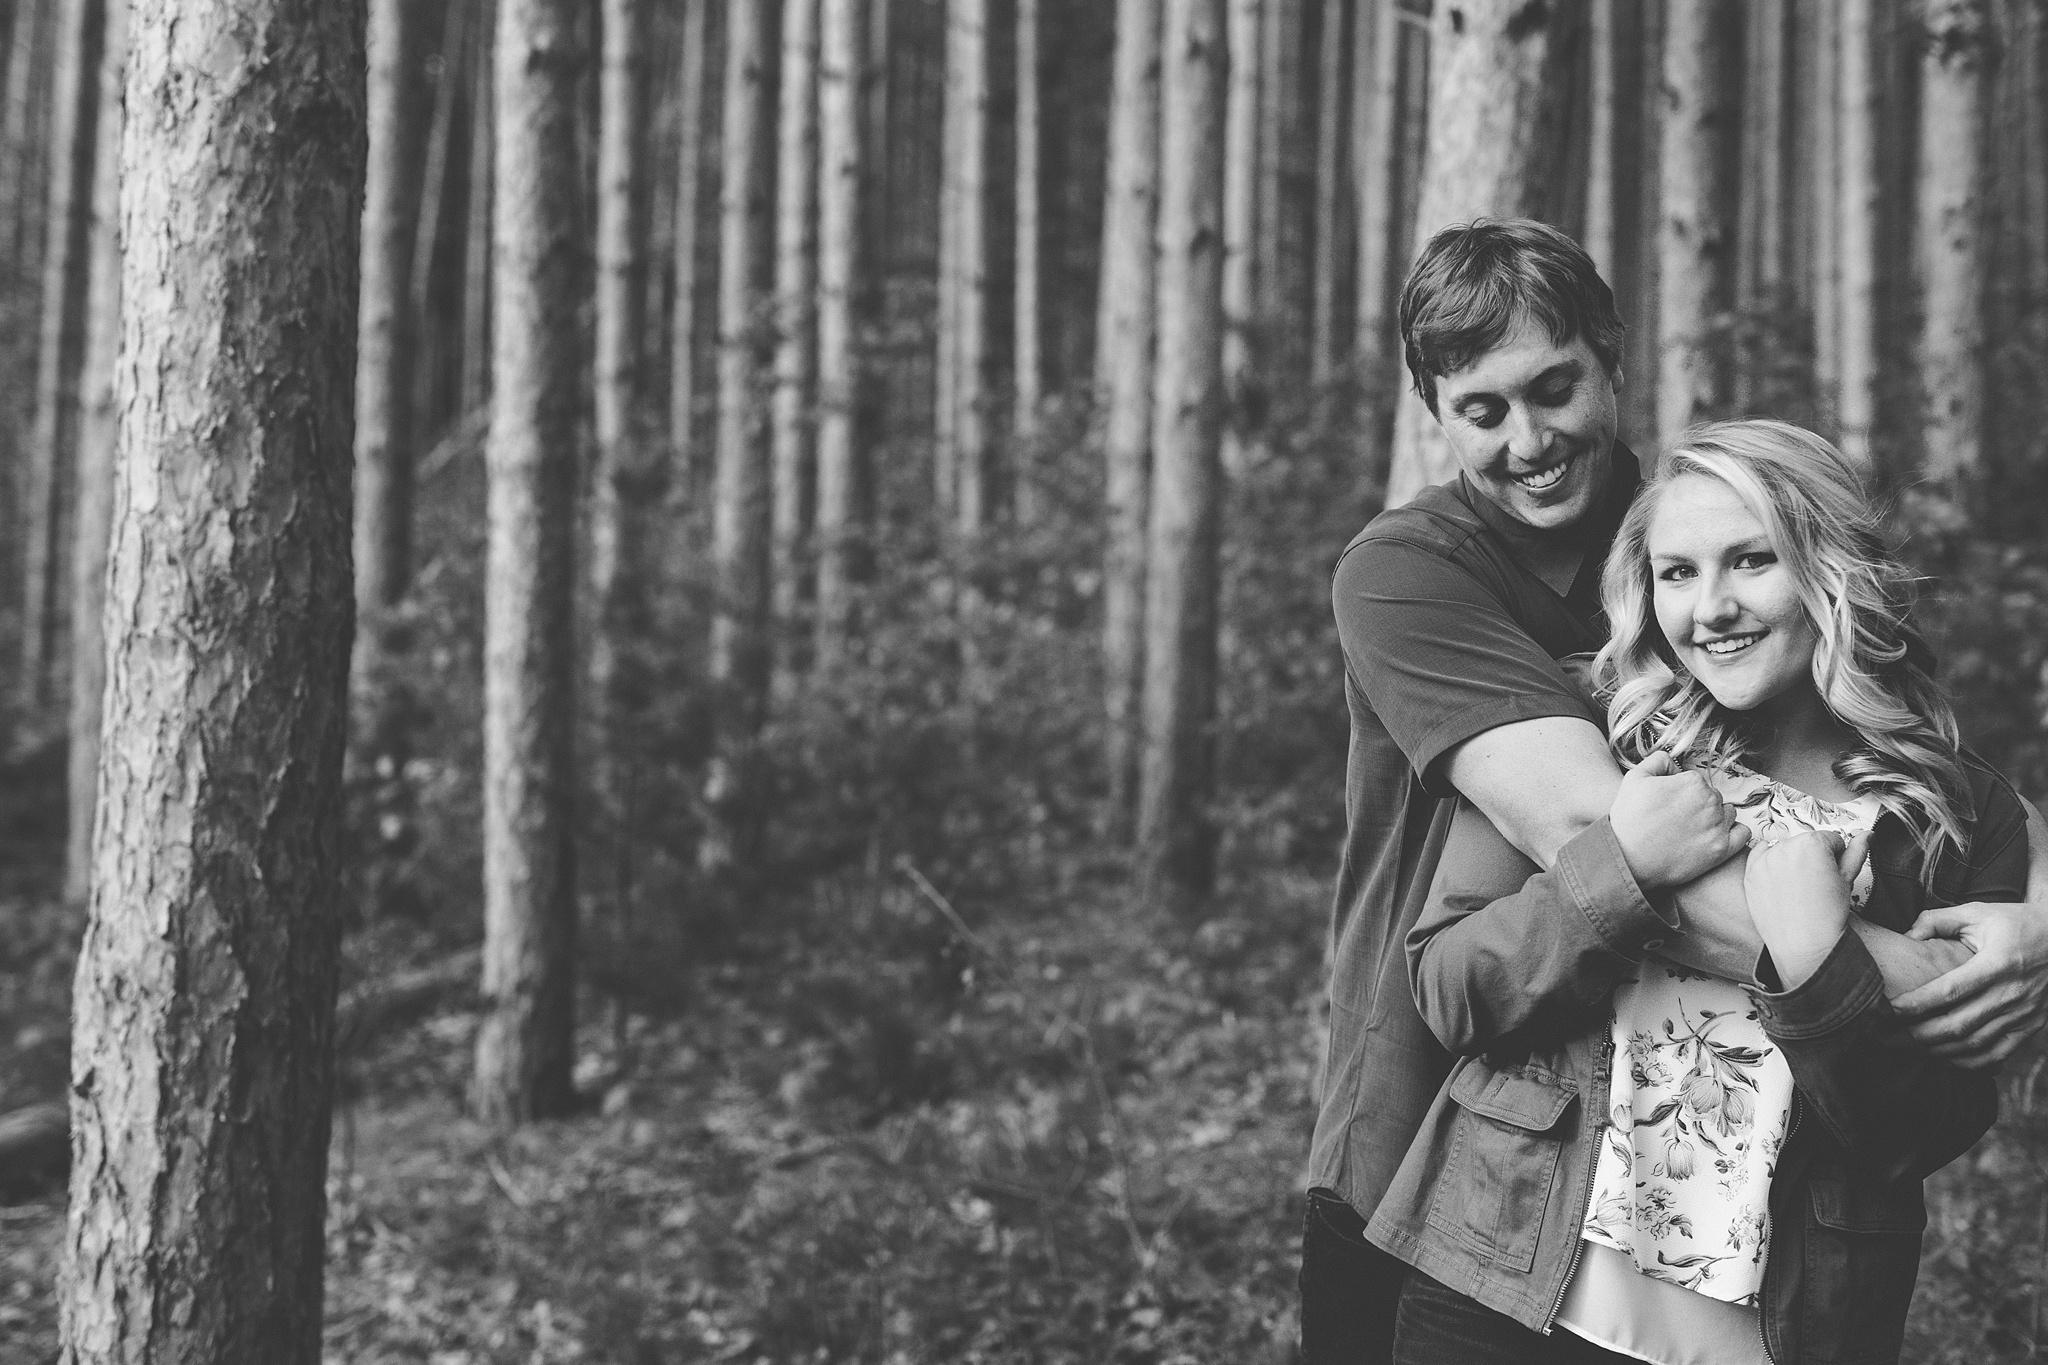 Chelsea&Nick_Engagement_0004.jpg